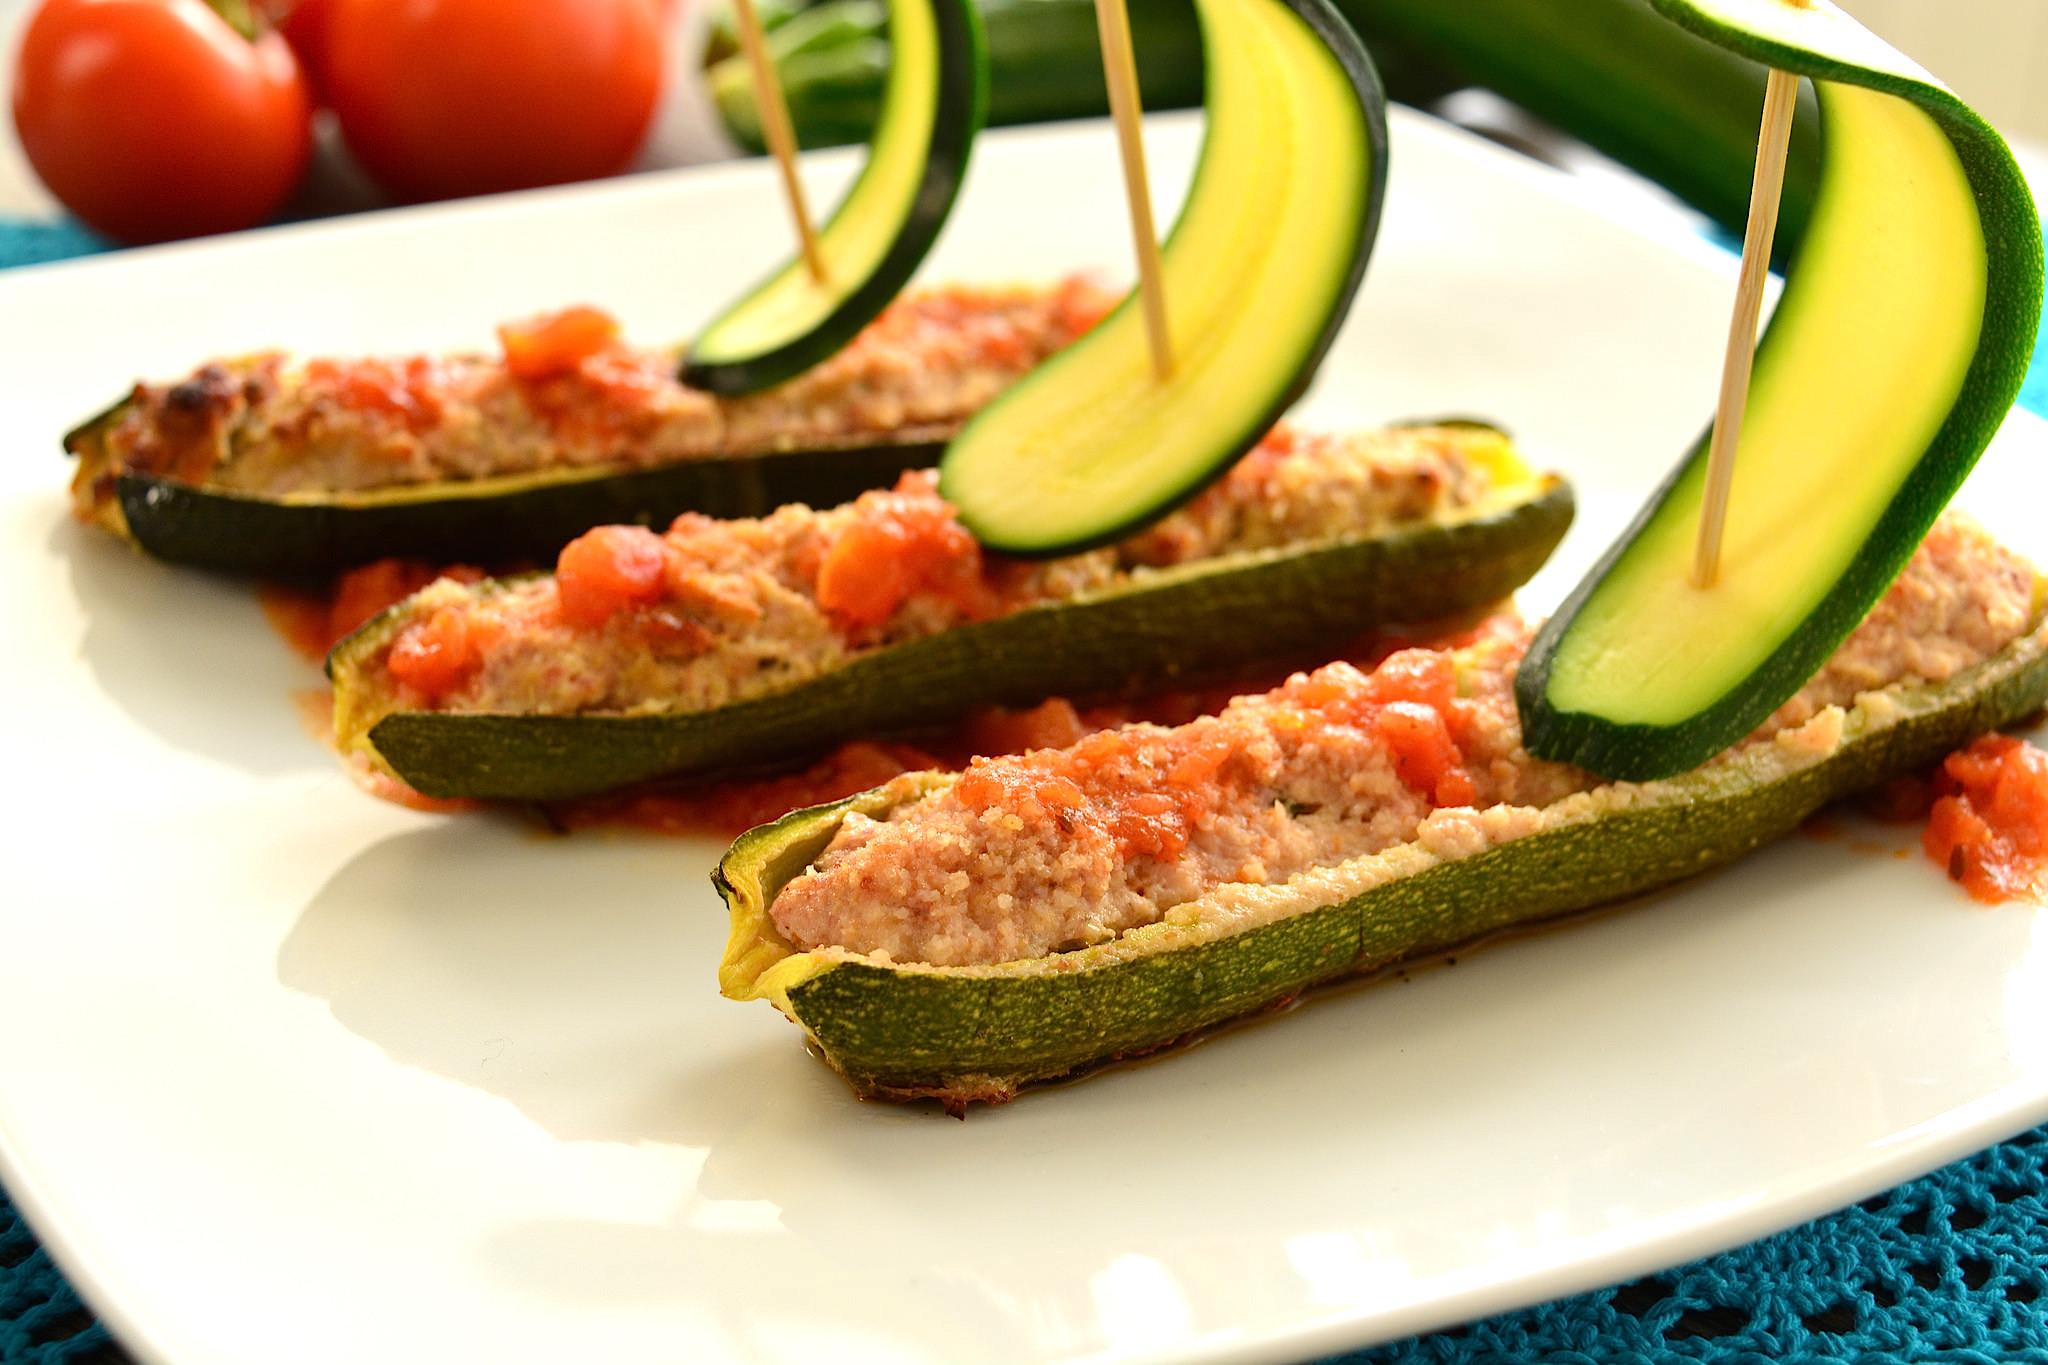 Zucchine ripiene di carne e salsiccia bimby tm31 tm5 for Cucinare le zucchine